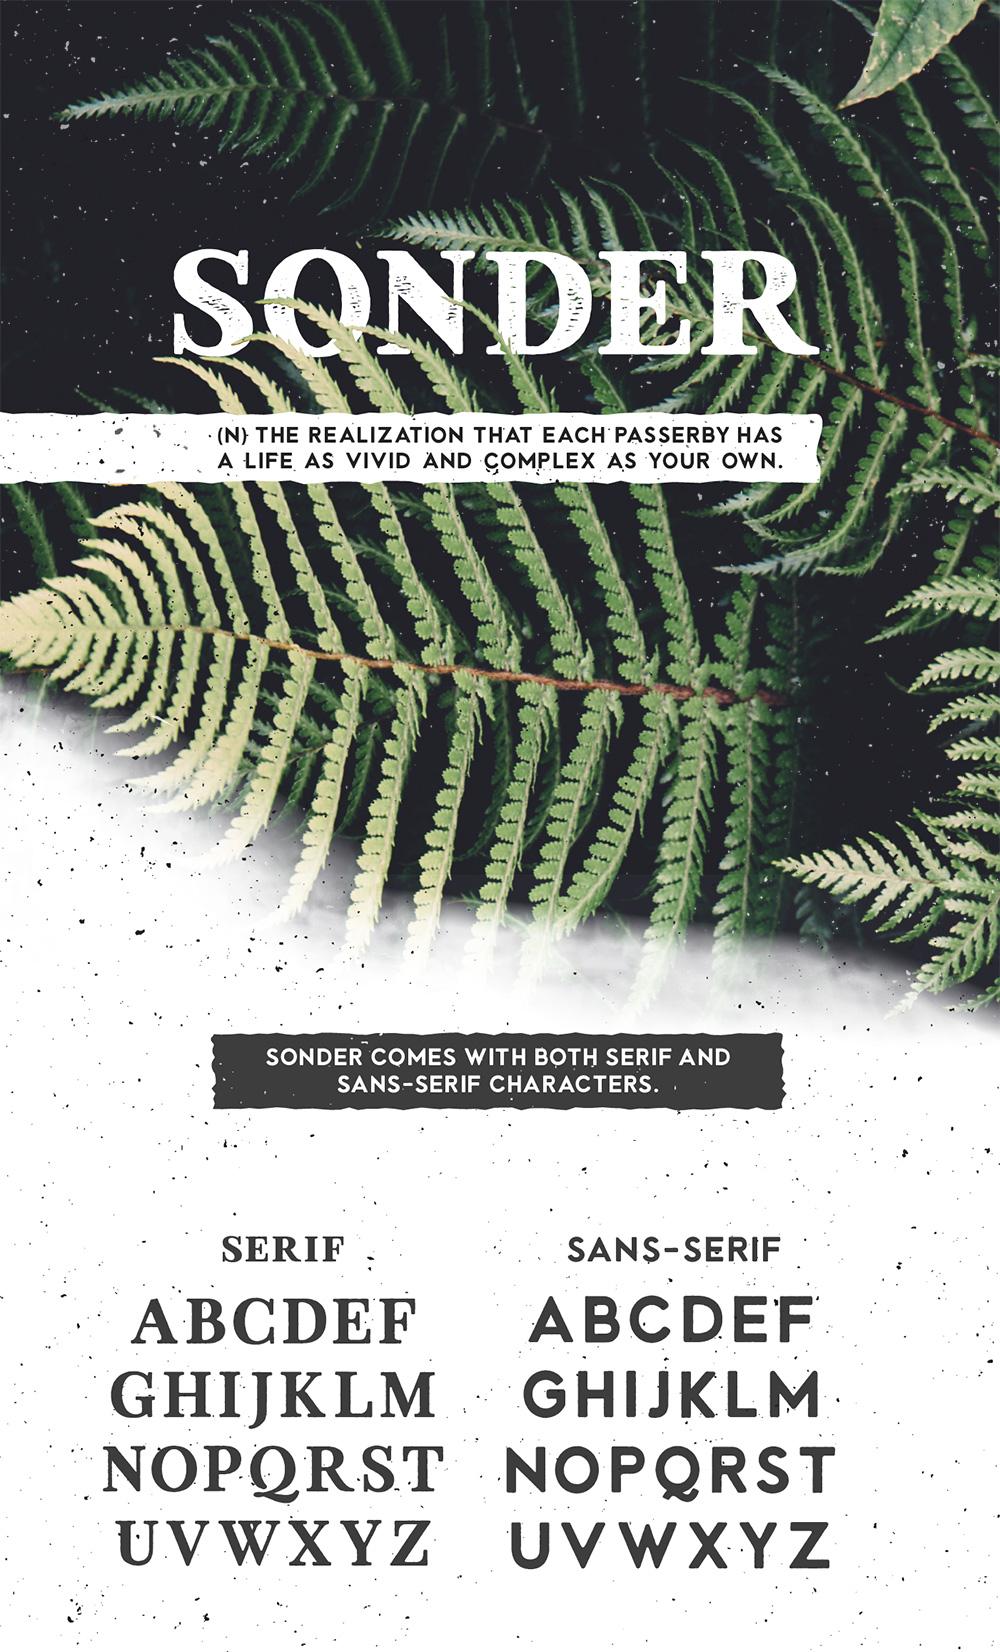 Sonder Free Type Family - Vintage Adventure Font